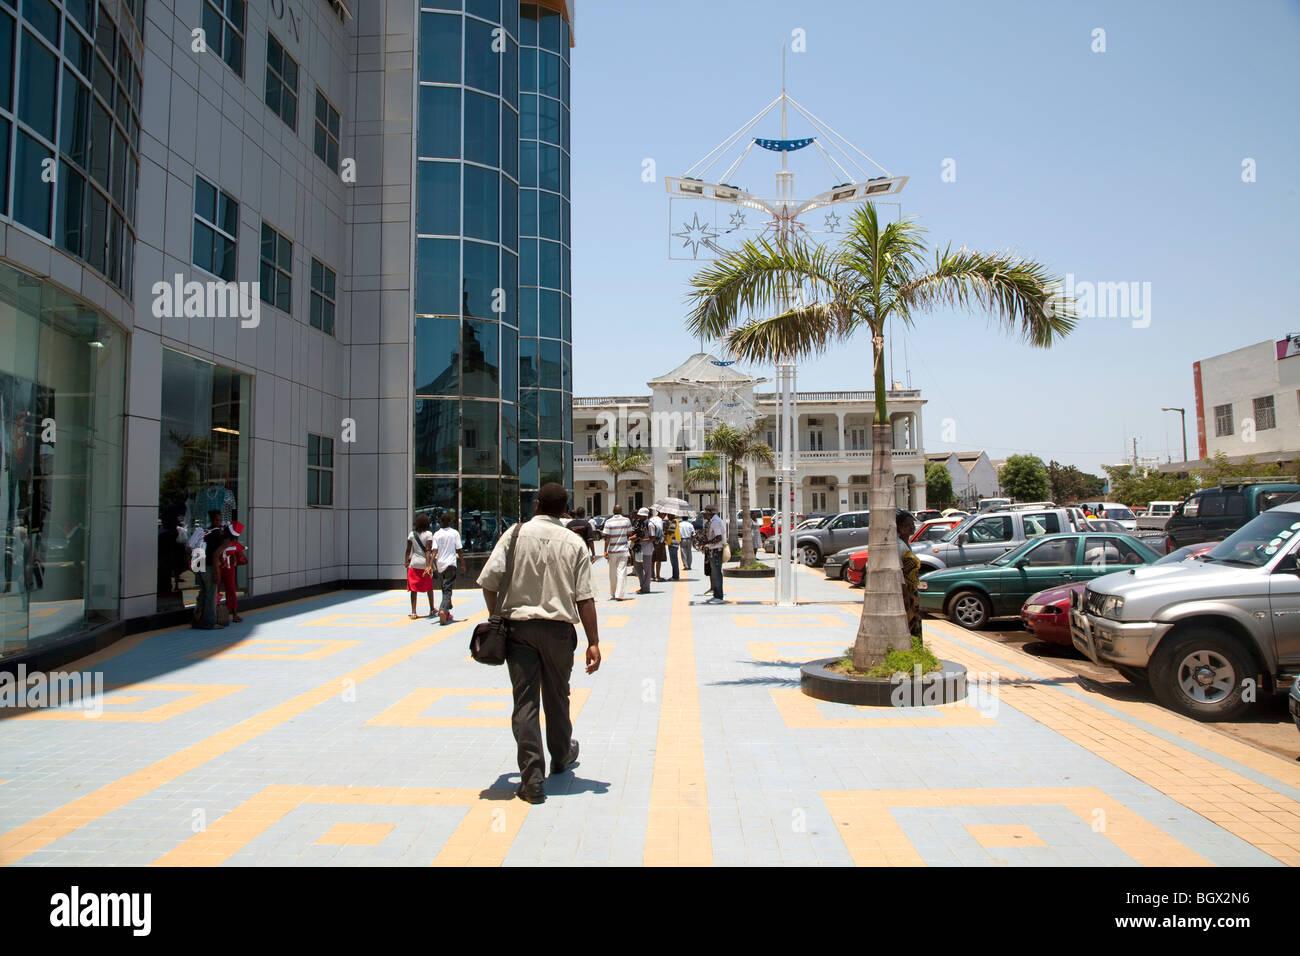 Outside the Maputo Shopping center, Mozambique - Stock Image